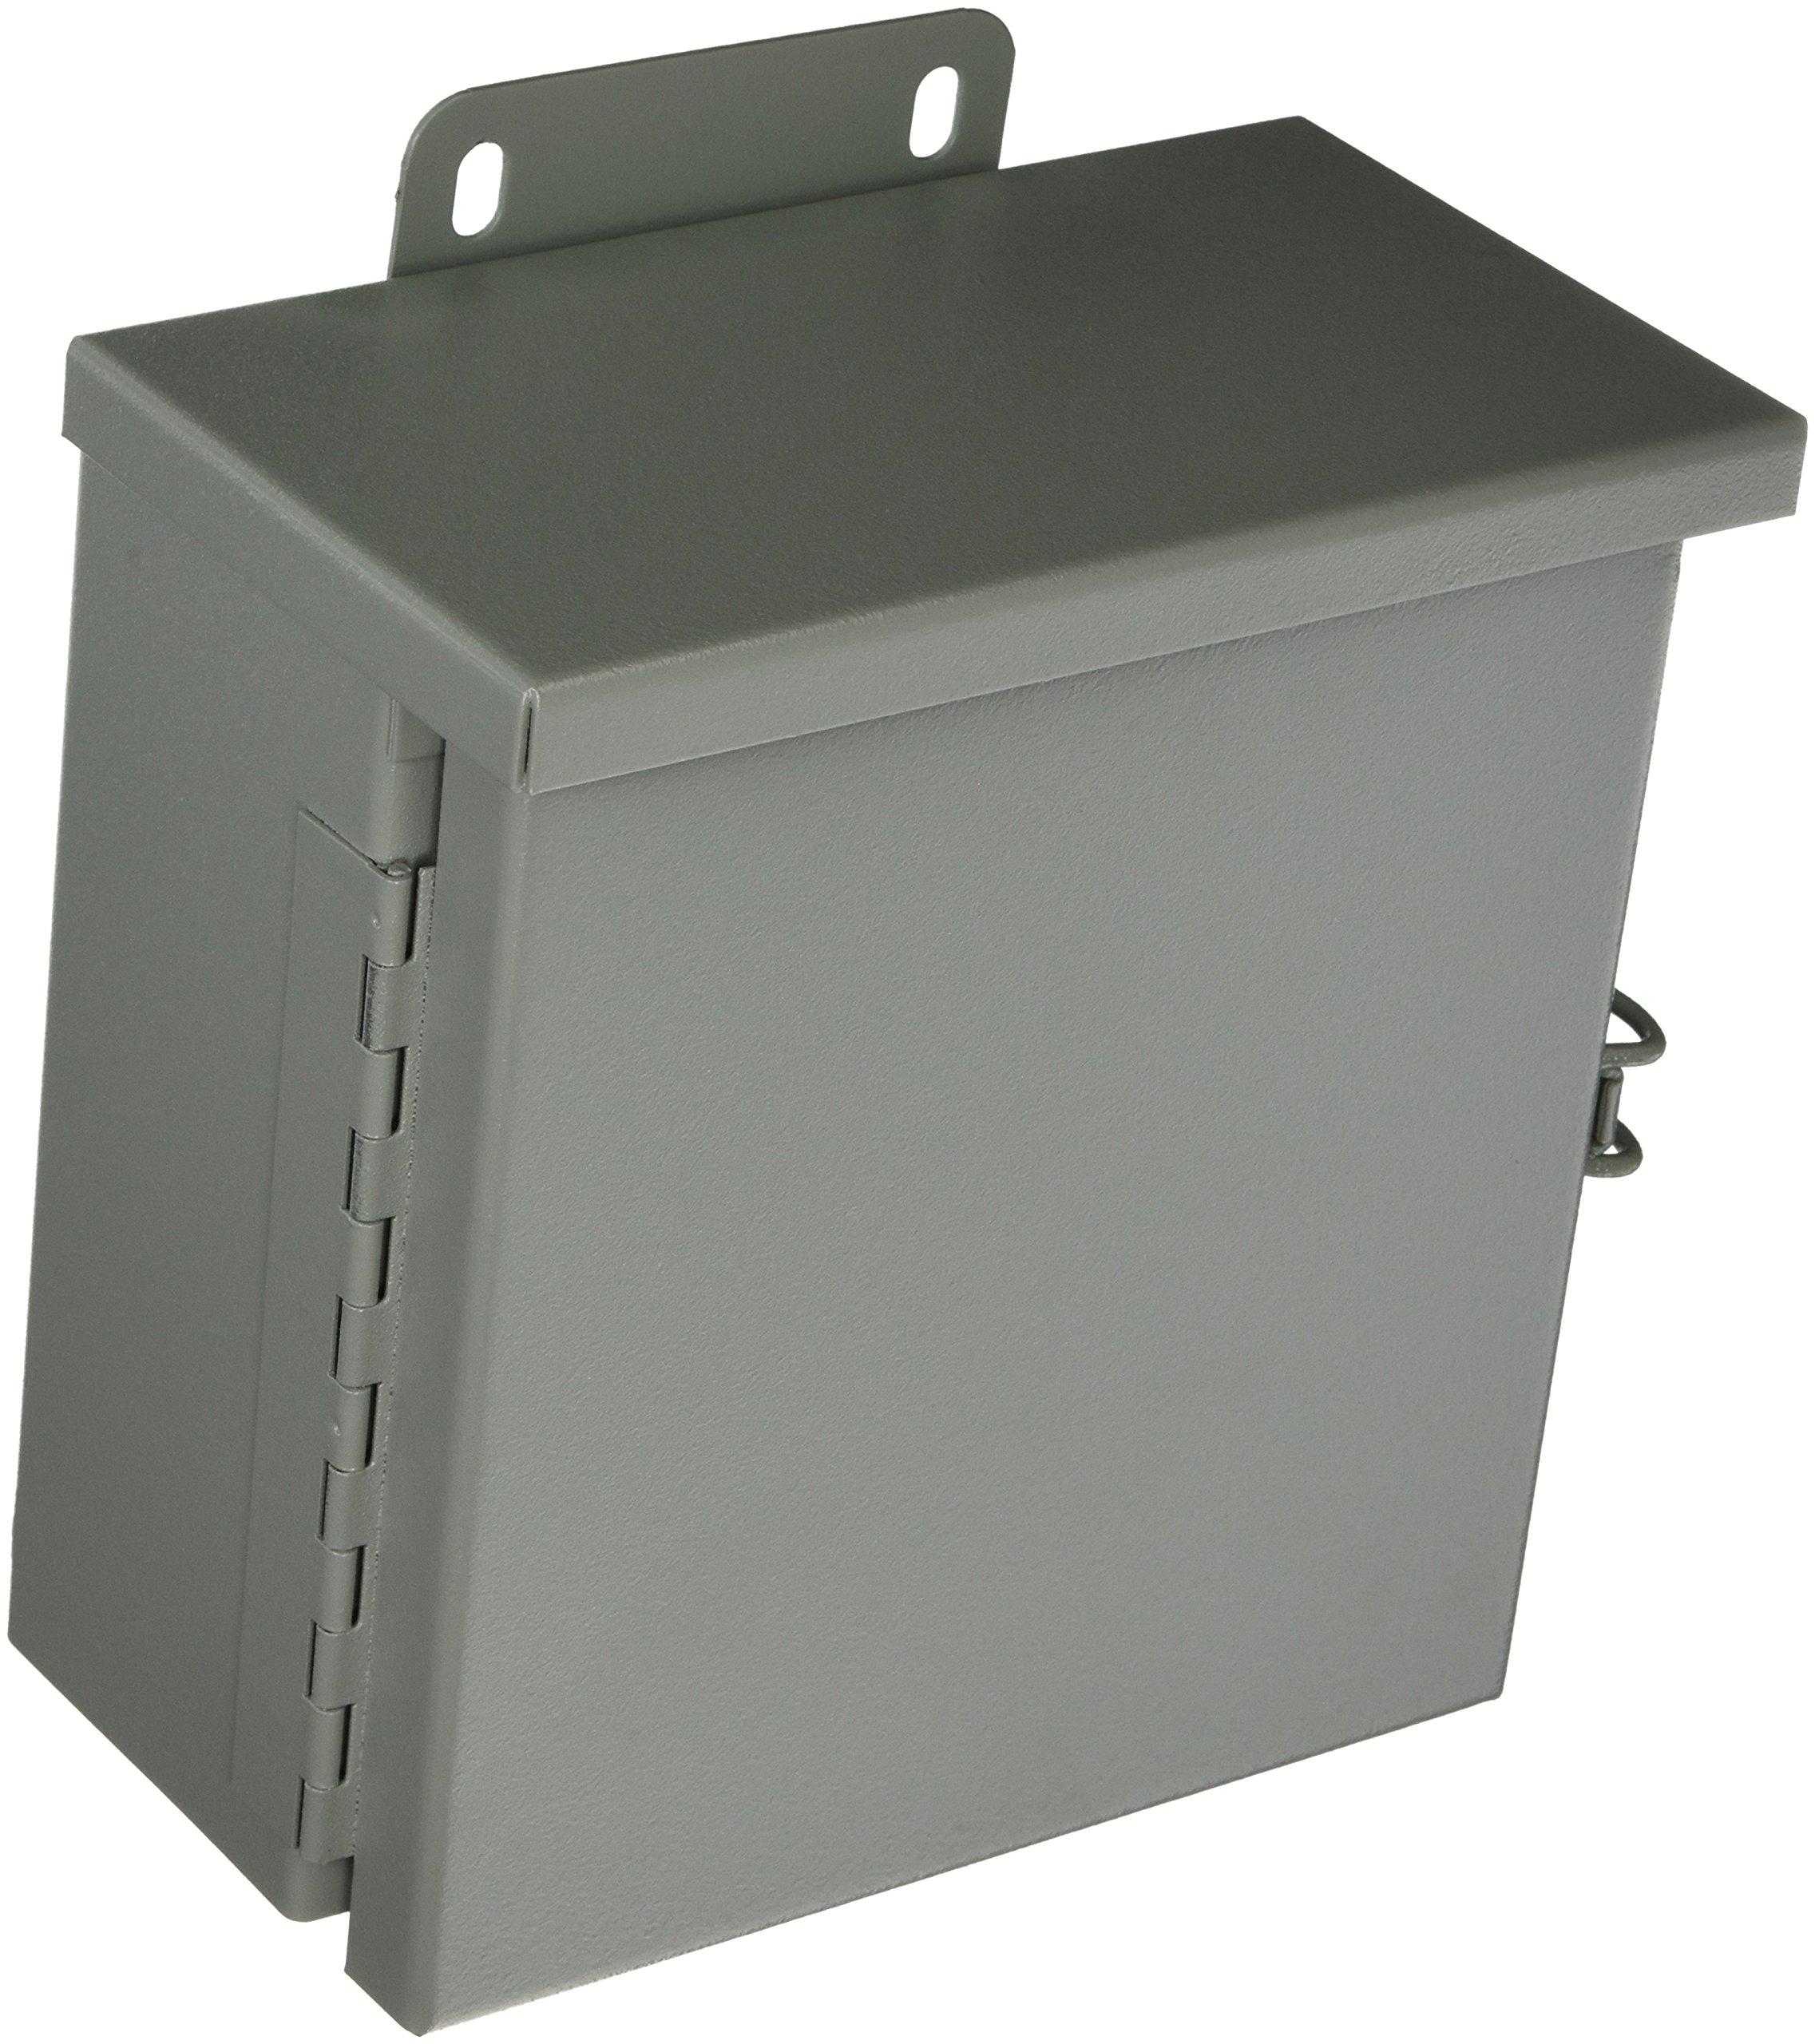 Wiegmann RHC080804 RHC-Series NEMA 3R Rainproof Hinge Cover Wall-Mount Enclosure, Carbon Steel, Small, 8'' x 8'' x 4''